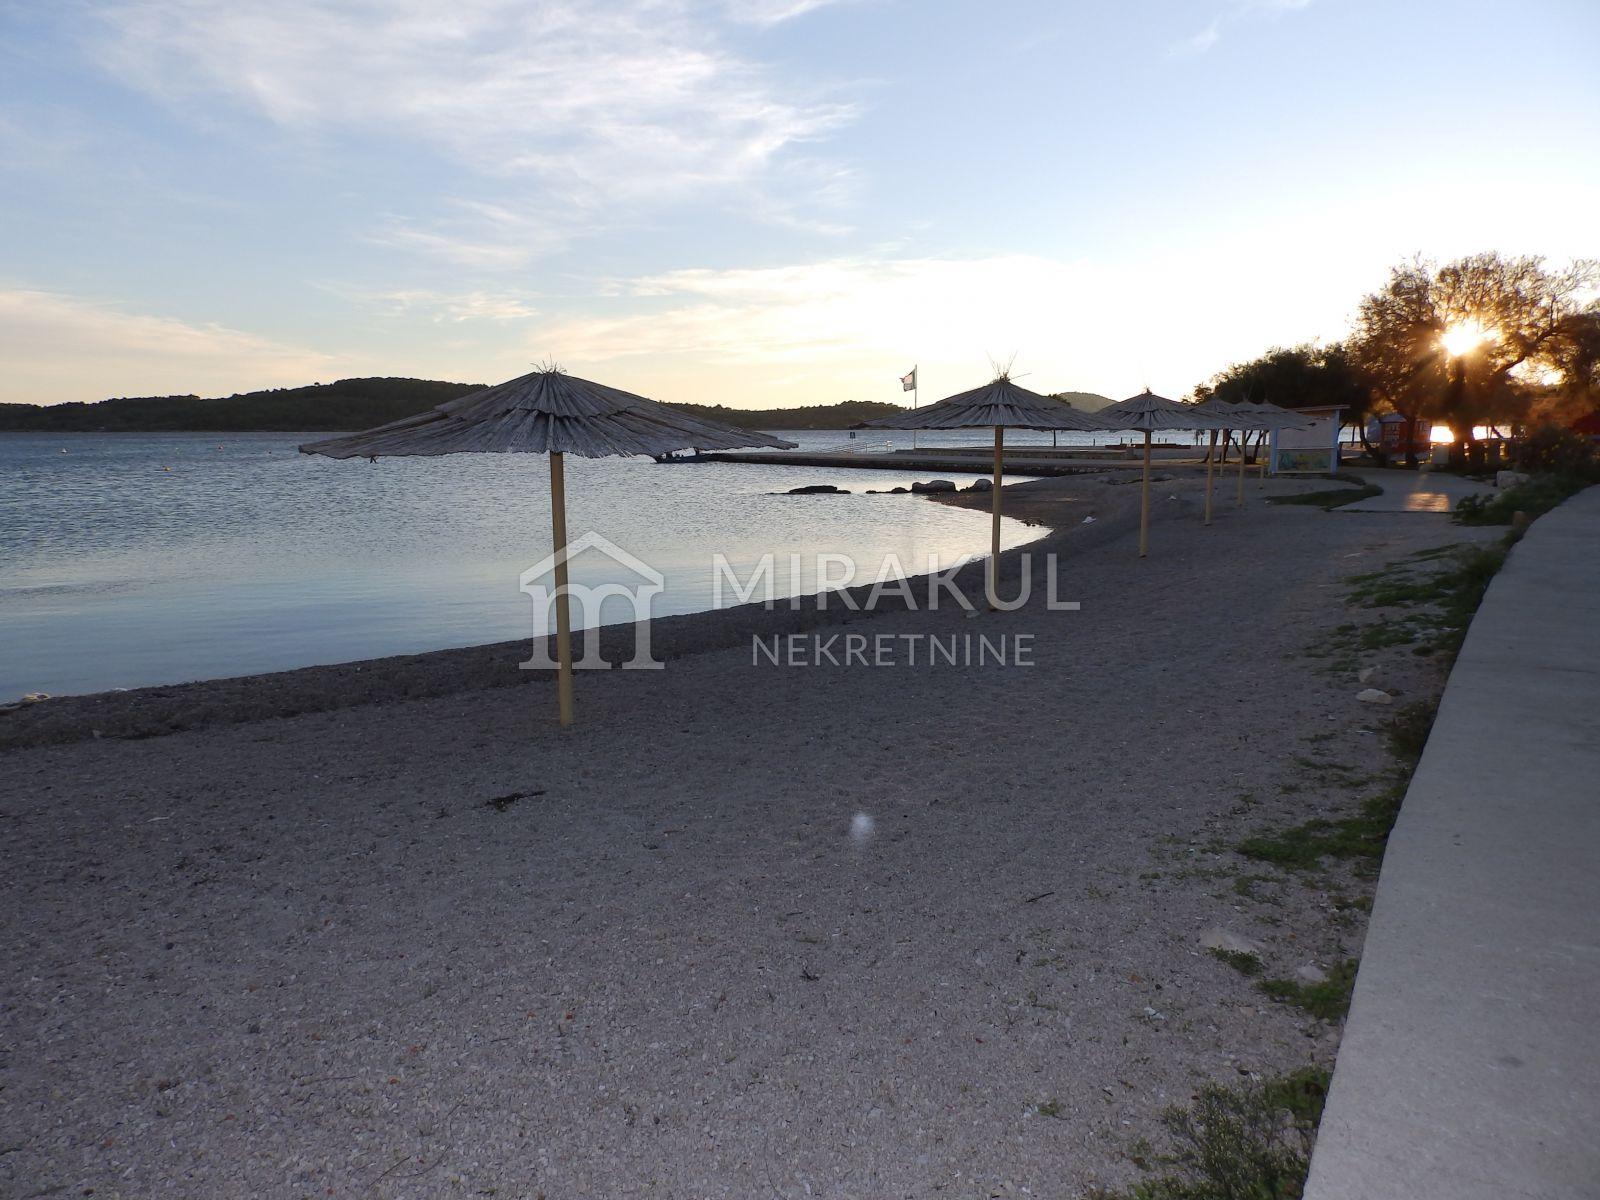 Properties Srima Croatia, flat, Mirakul Real Estate agency, ID - AS-653, Flat first row to the sea 5